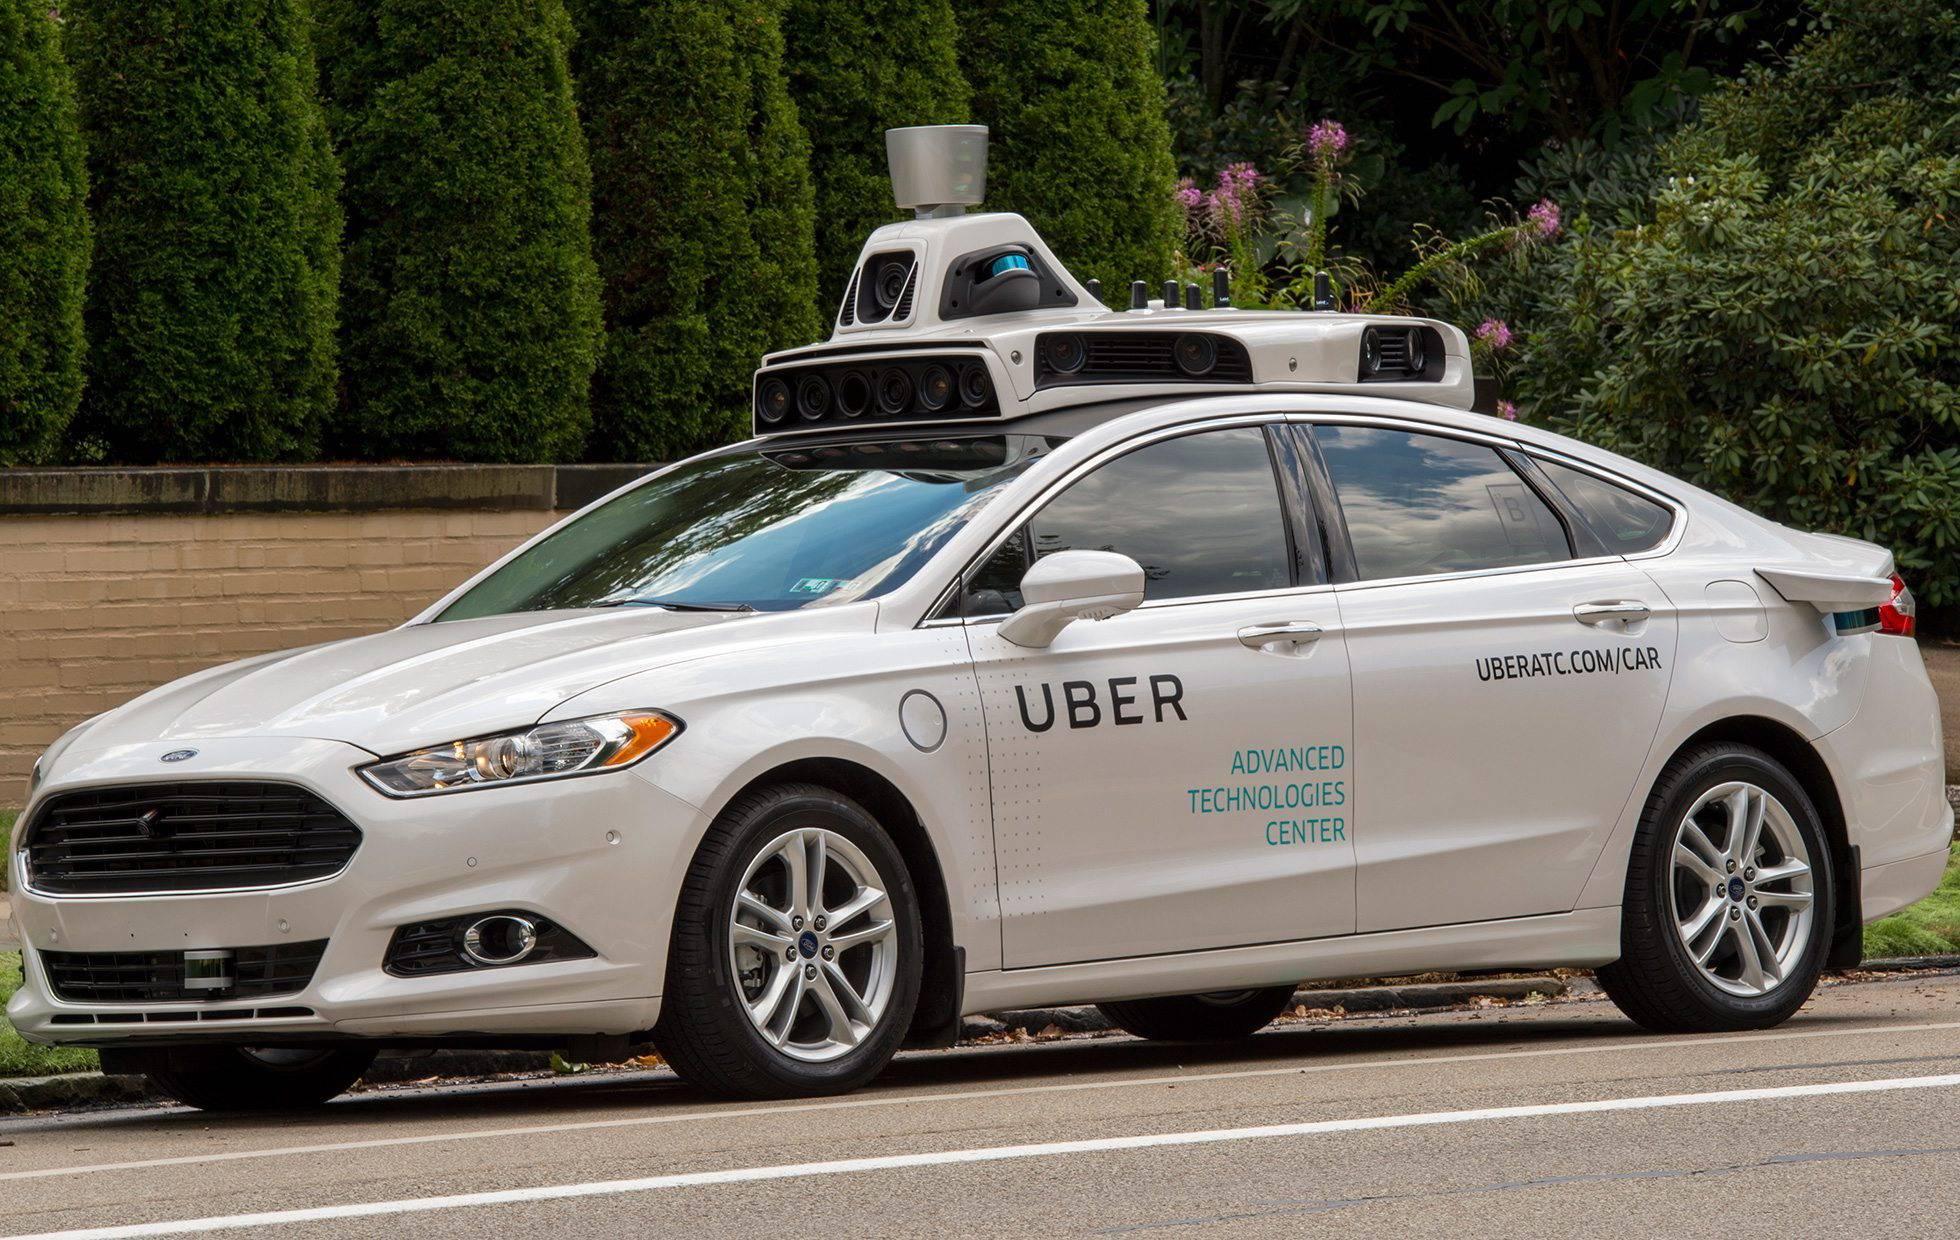 Vehículo autómata de Uber atropella a mujer en Arizona